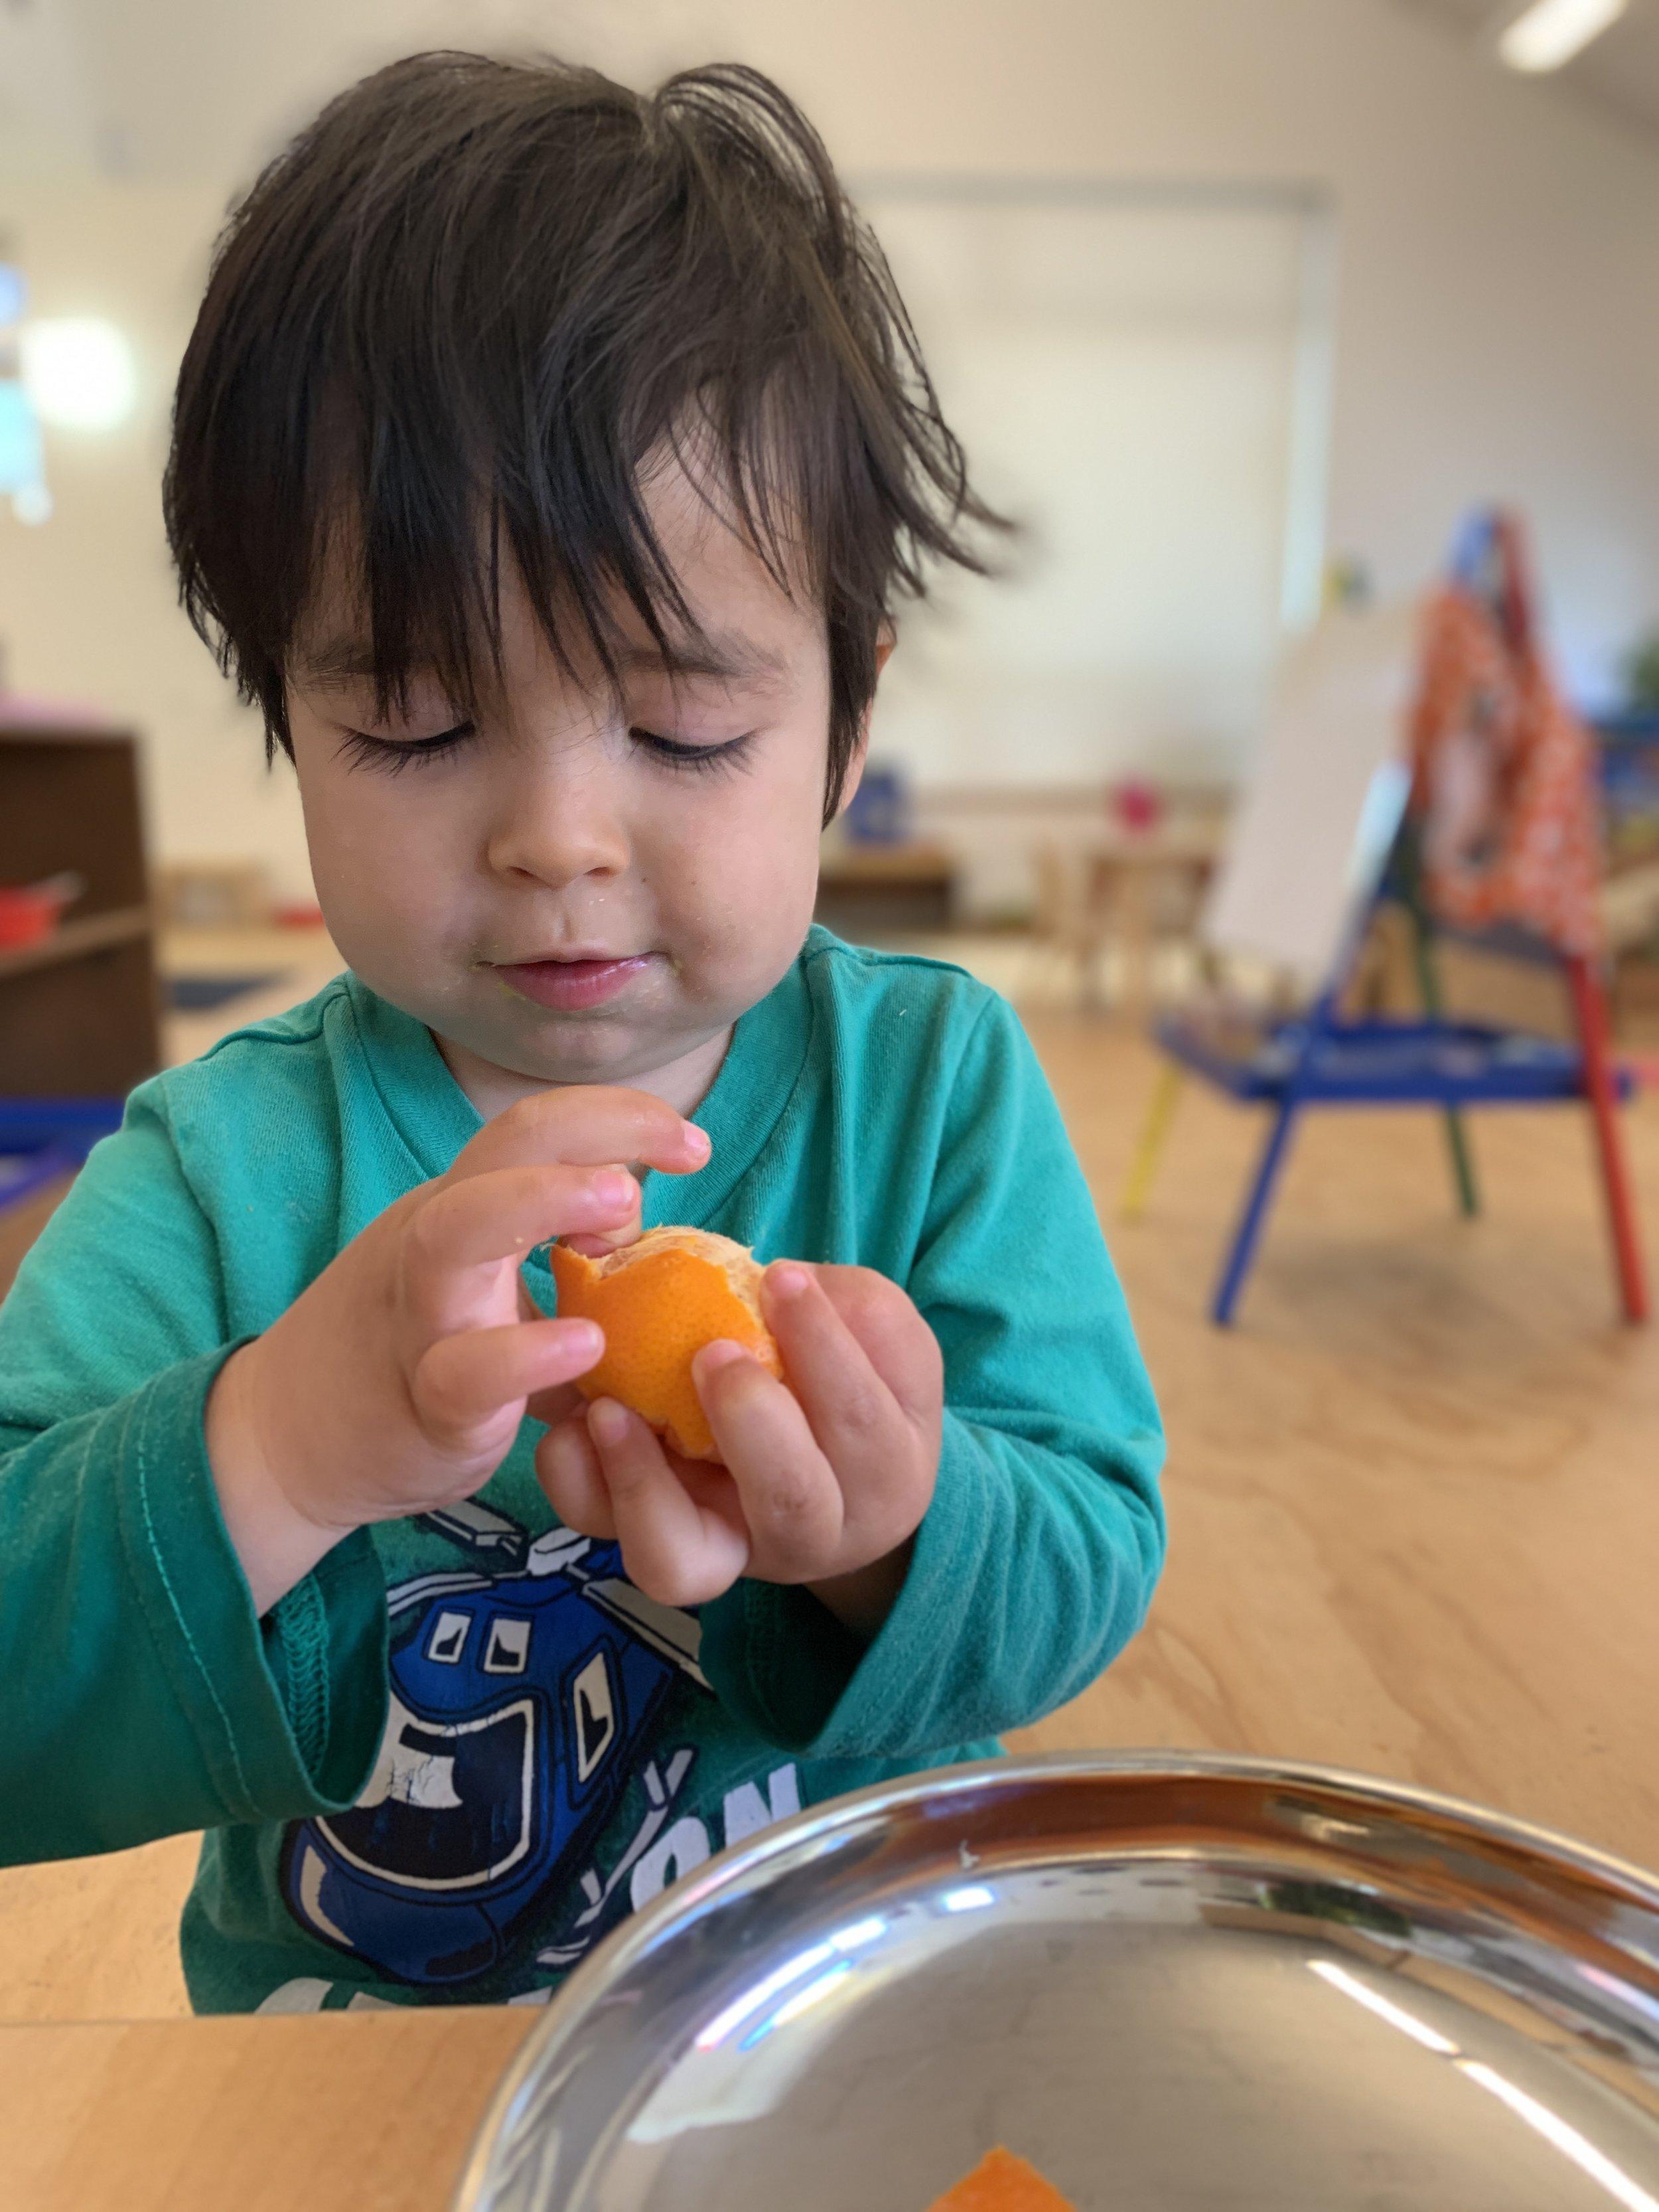 mateo clementine peeling.jpg